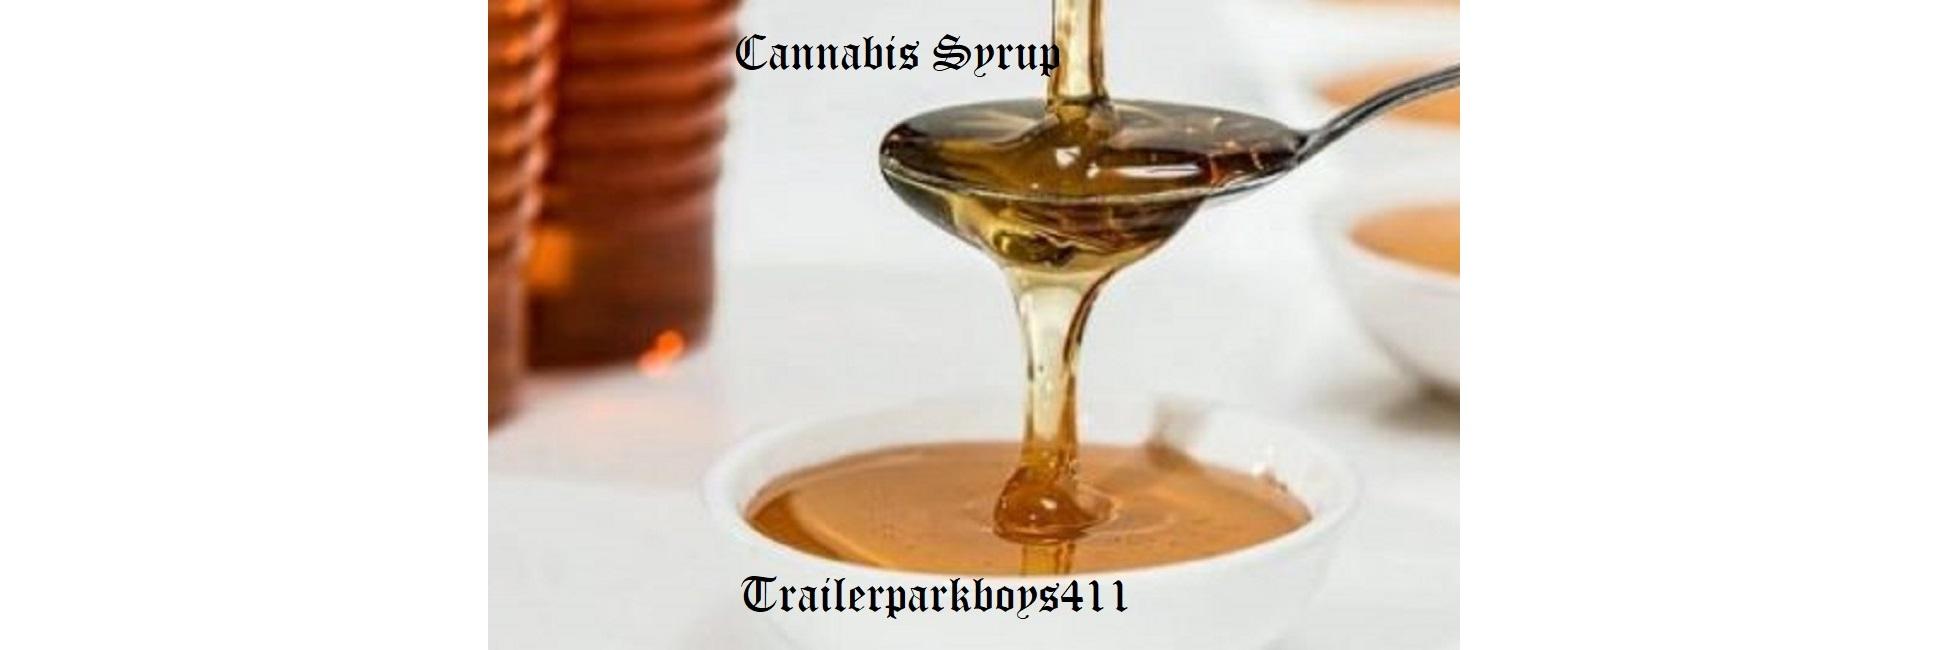 Cannabis Syrup